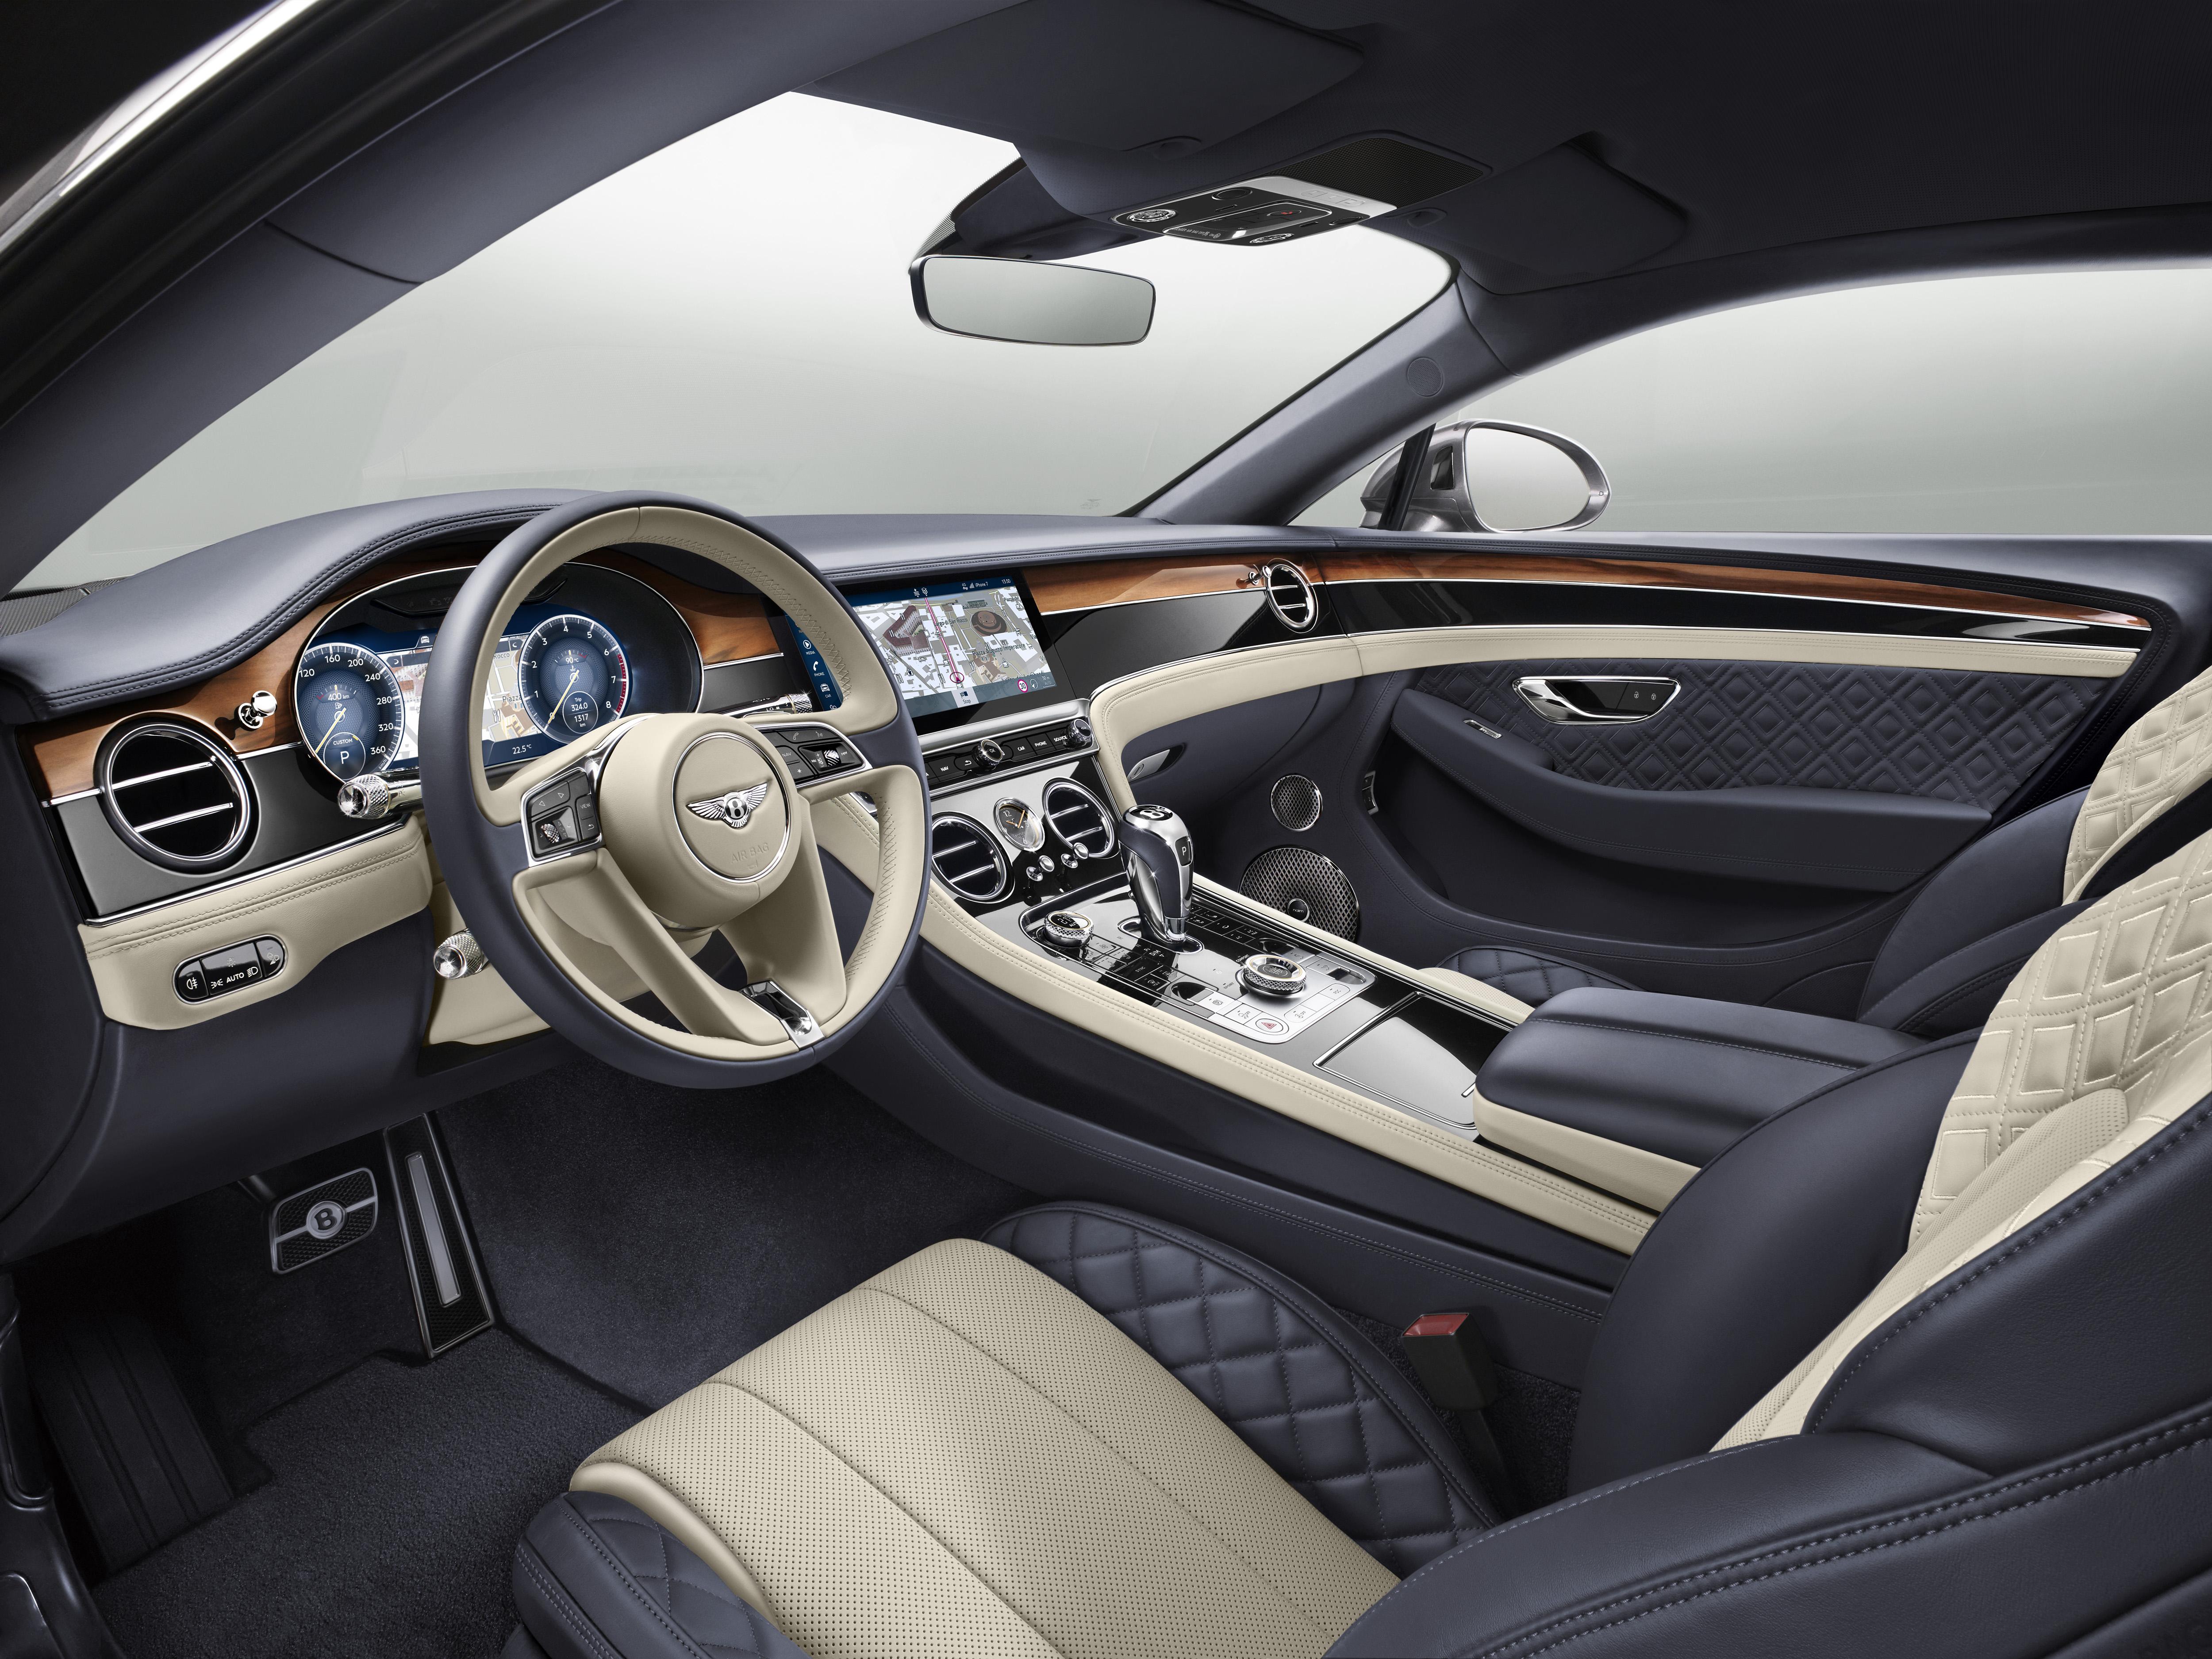 Continental Gt Sports Bentley S Sinewy New Interior Design Wardsauto